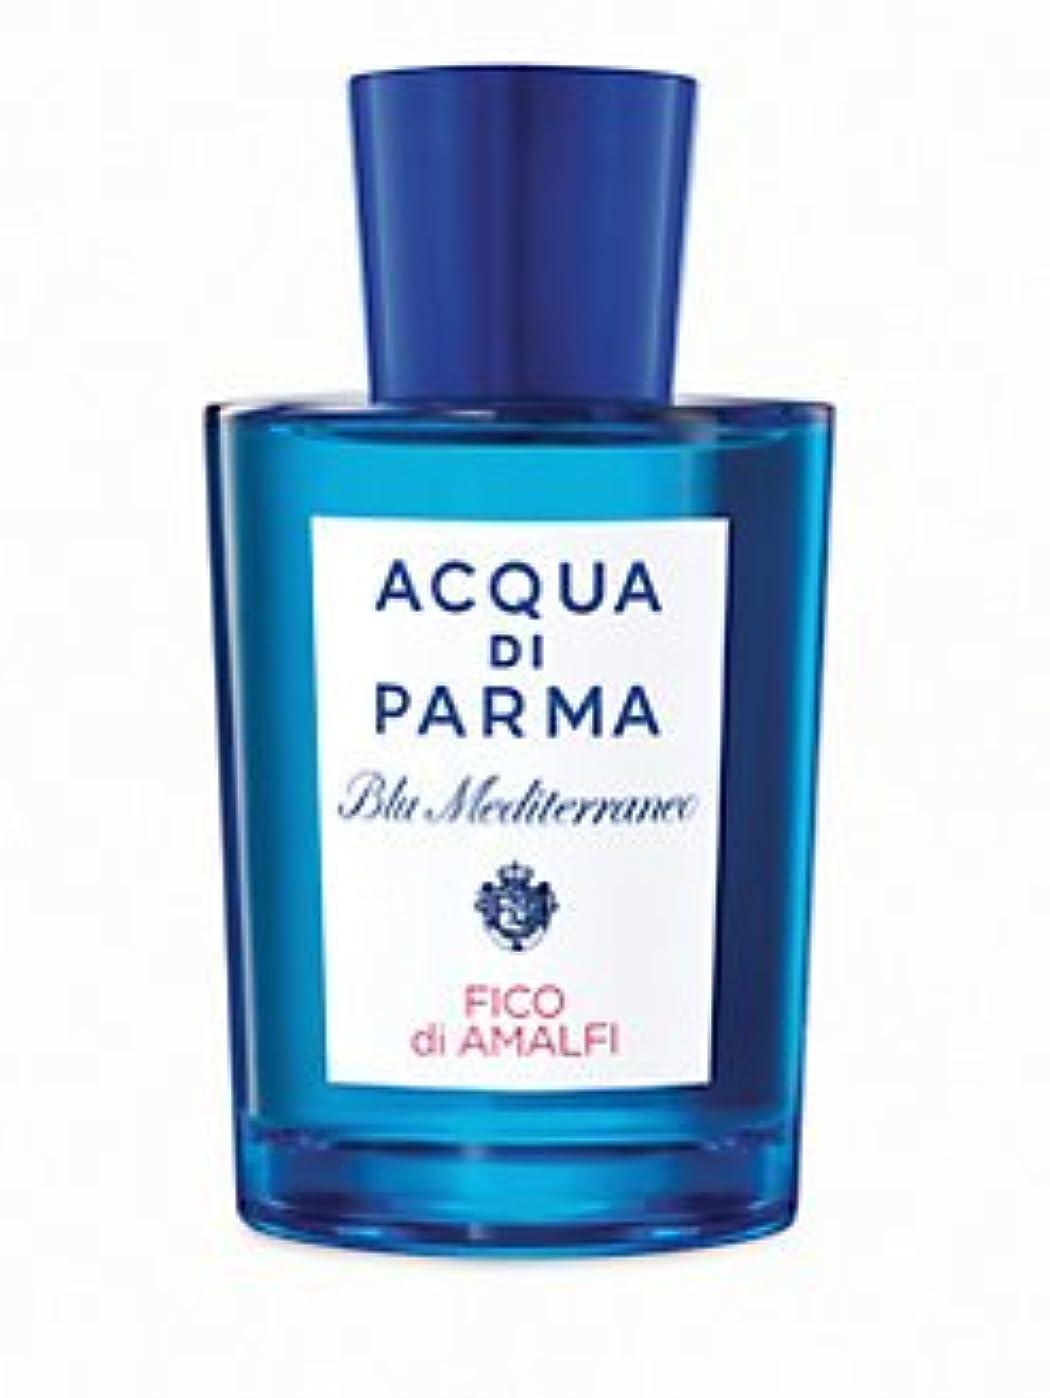 Blu Mediterraneo Fico di Amalfi (ブルー メディタレーネオ フィコ ディ アマルフィ) 6.9 oz (200ml) Vitalizing Body Cream by Acqua di Parma